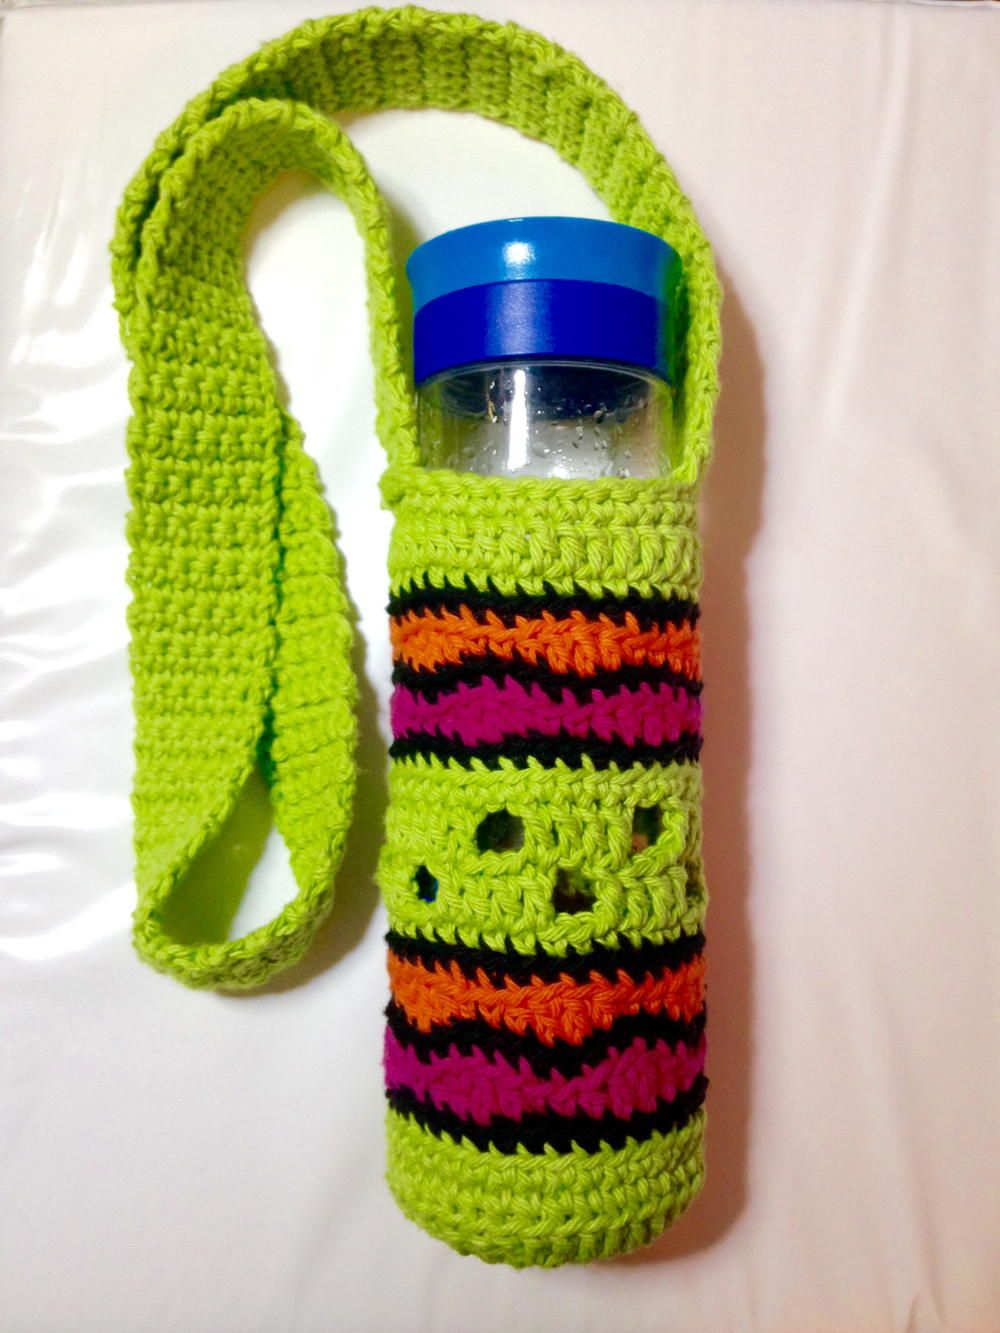 Making waves water bottle holder water bottle holders making making waves water bottle holder crochet bag patternscrochet bankloansurffo Choice Image